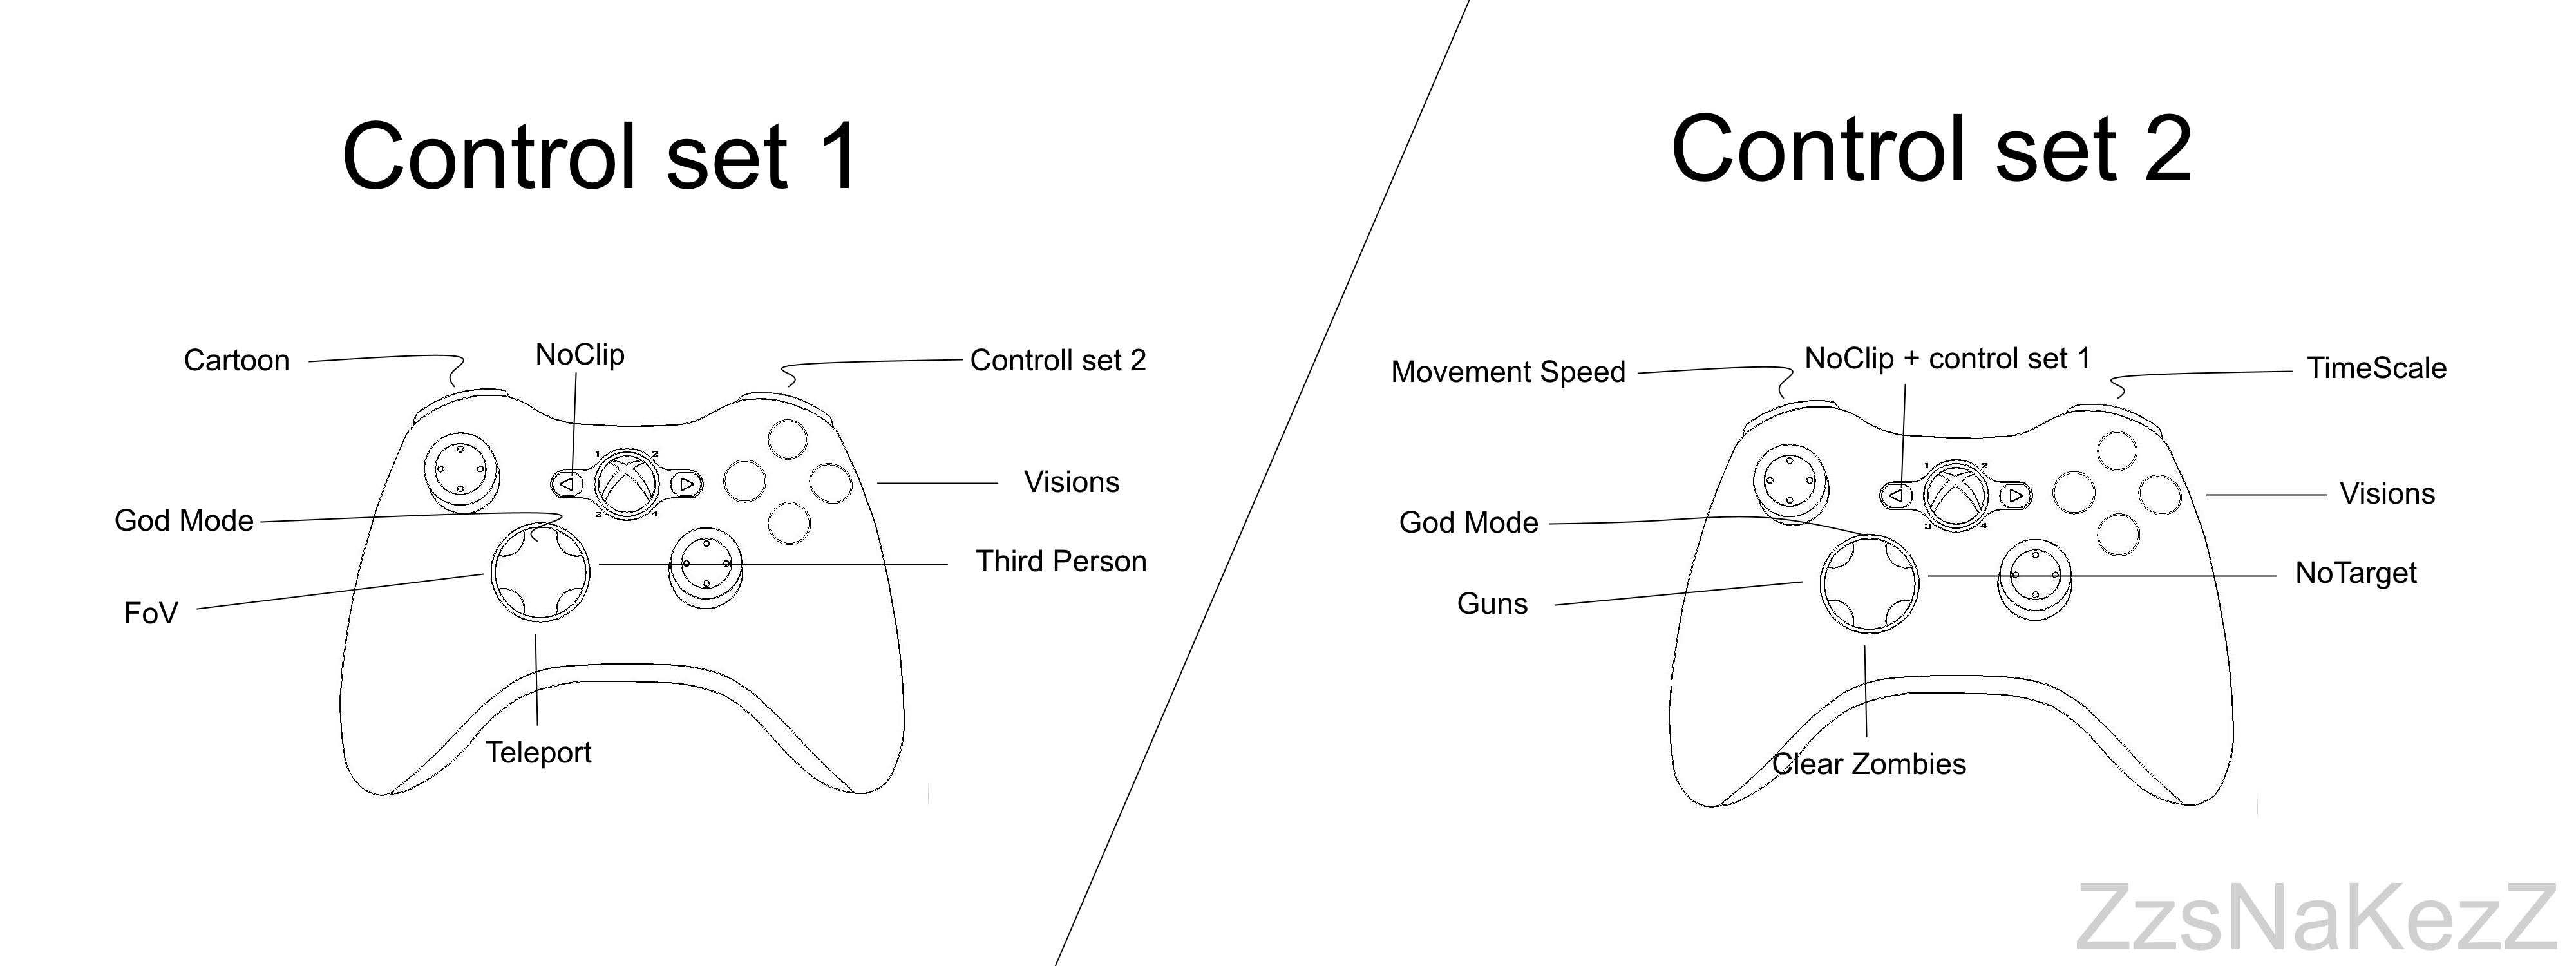 Black ops 1 Gpd mods (no jtag/rgh) - Xbox Gaming - WeMod Community